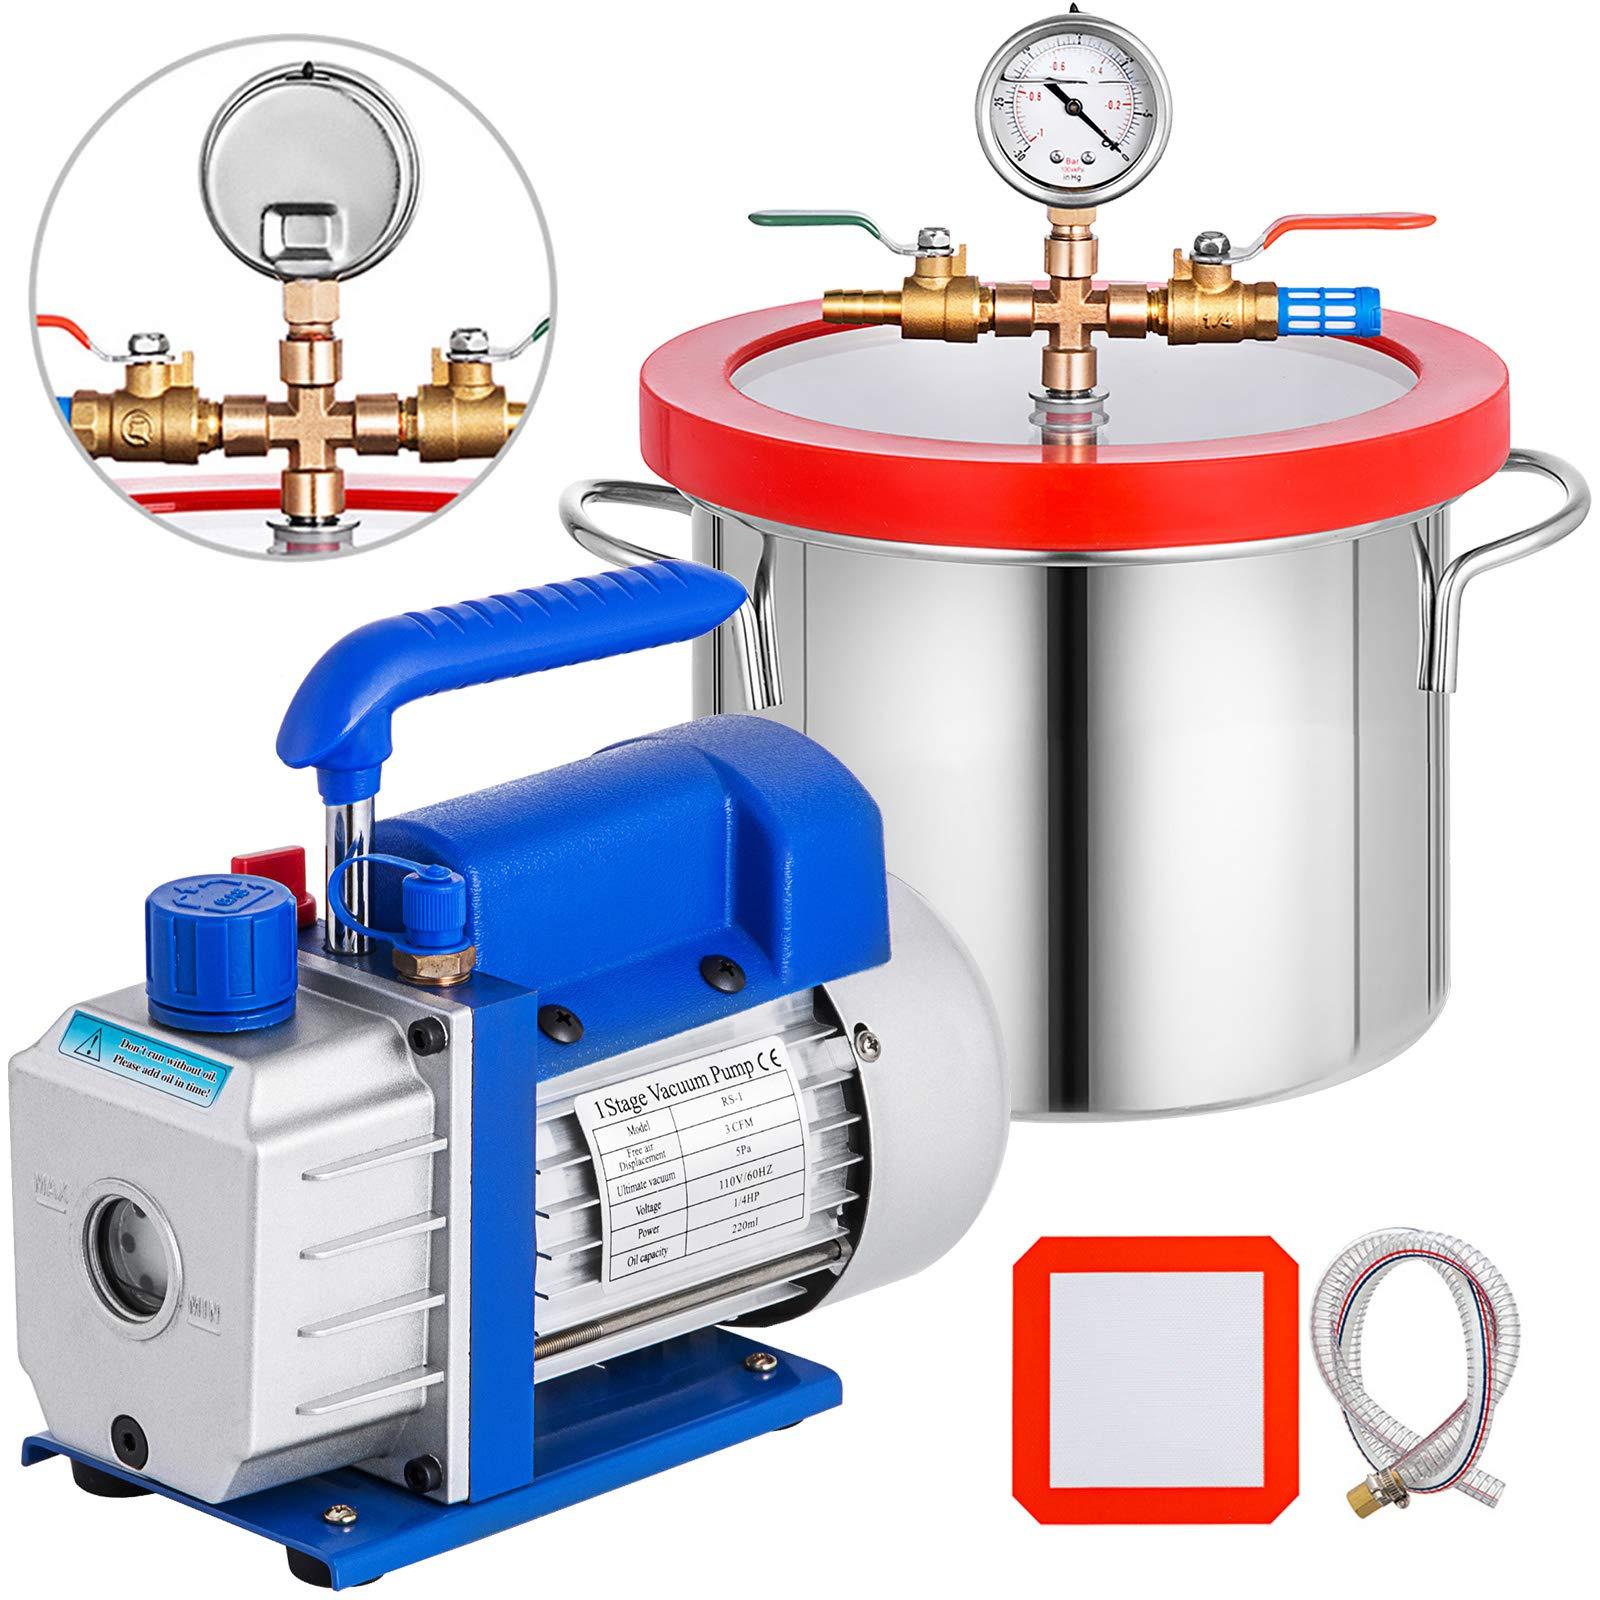 Bestauto 1.5 Gallon Vacuum Degassing Chamber Kit Stainless Steel Degassing Chamber 5.7L Vacuum Chamber Kit with 3 CFM 1/4 HP Vacuum Pump HVAC(3CFM Vacuum Pump + 1.5 Gallon Vacuum Chamber) by Best In Auto